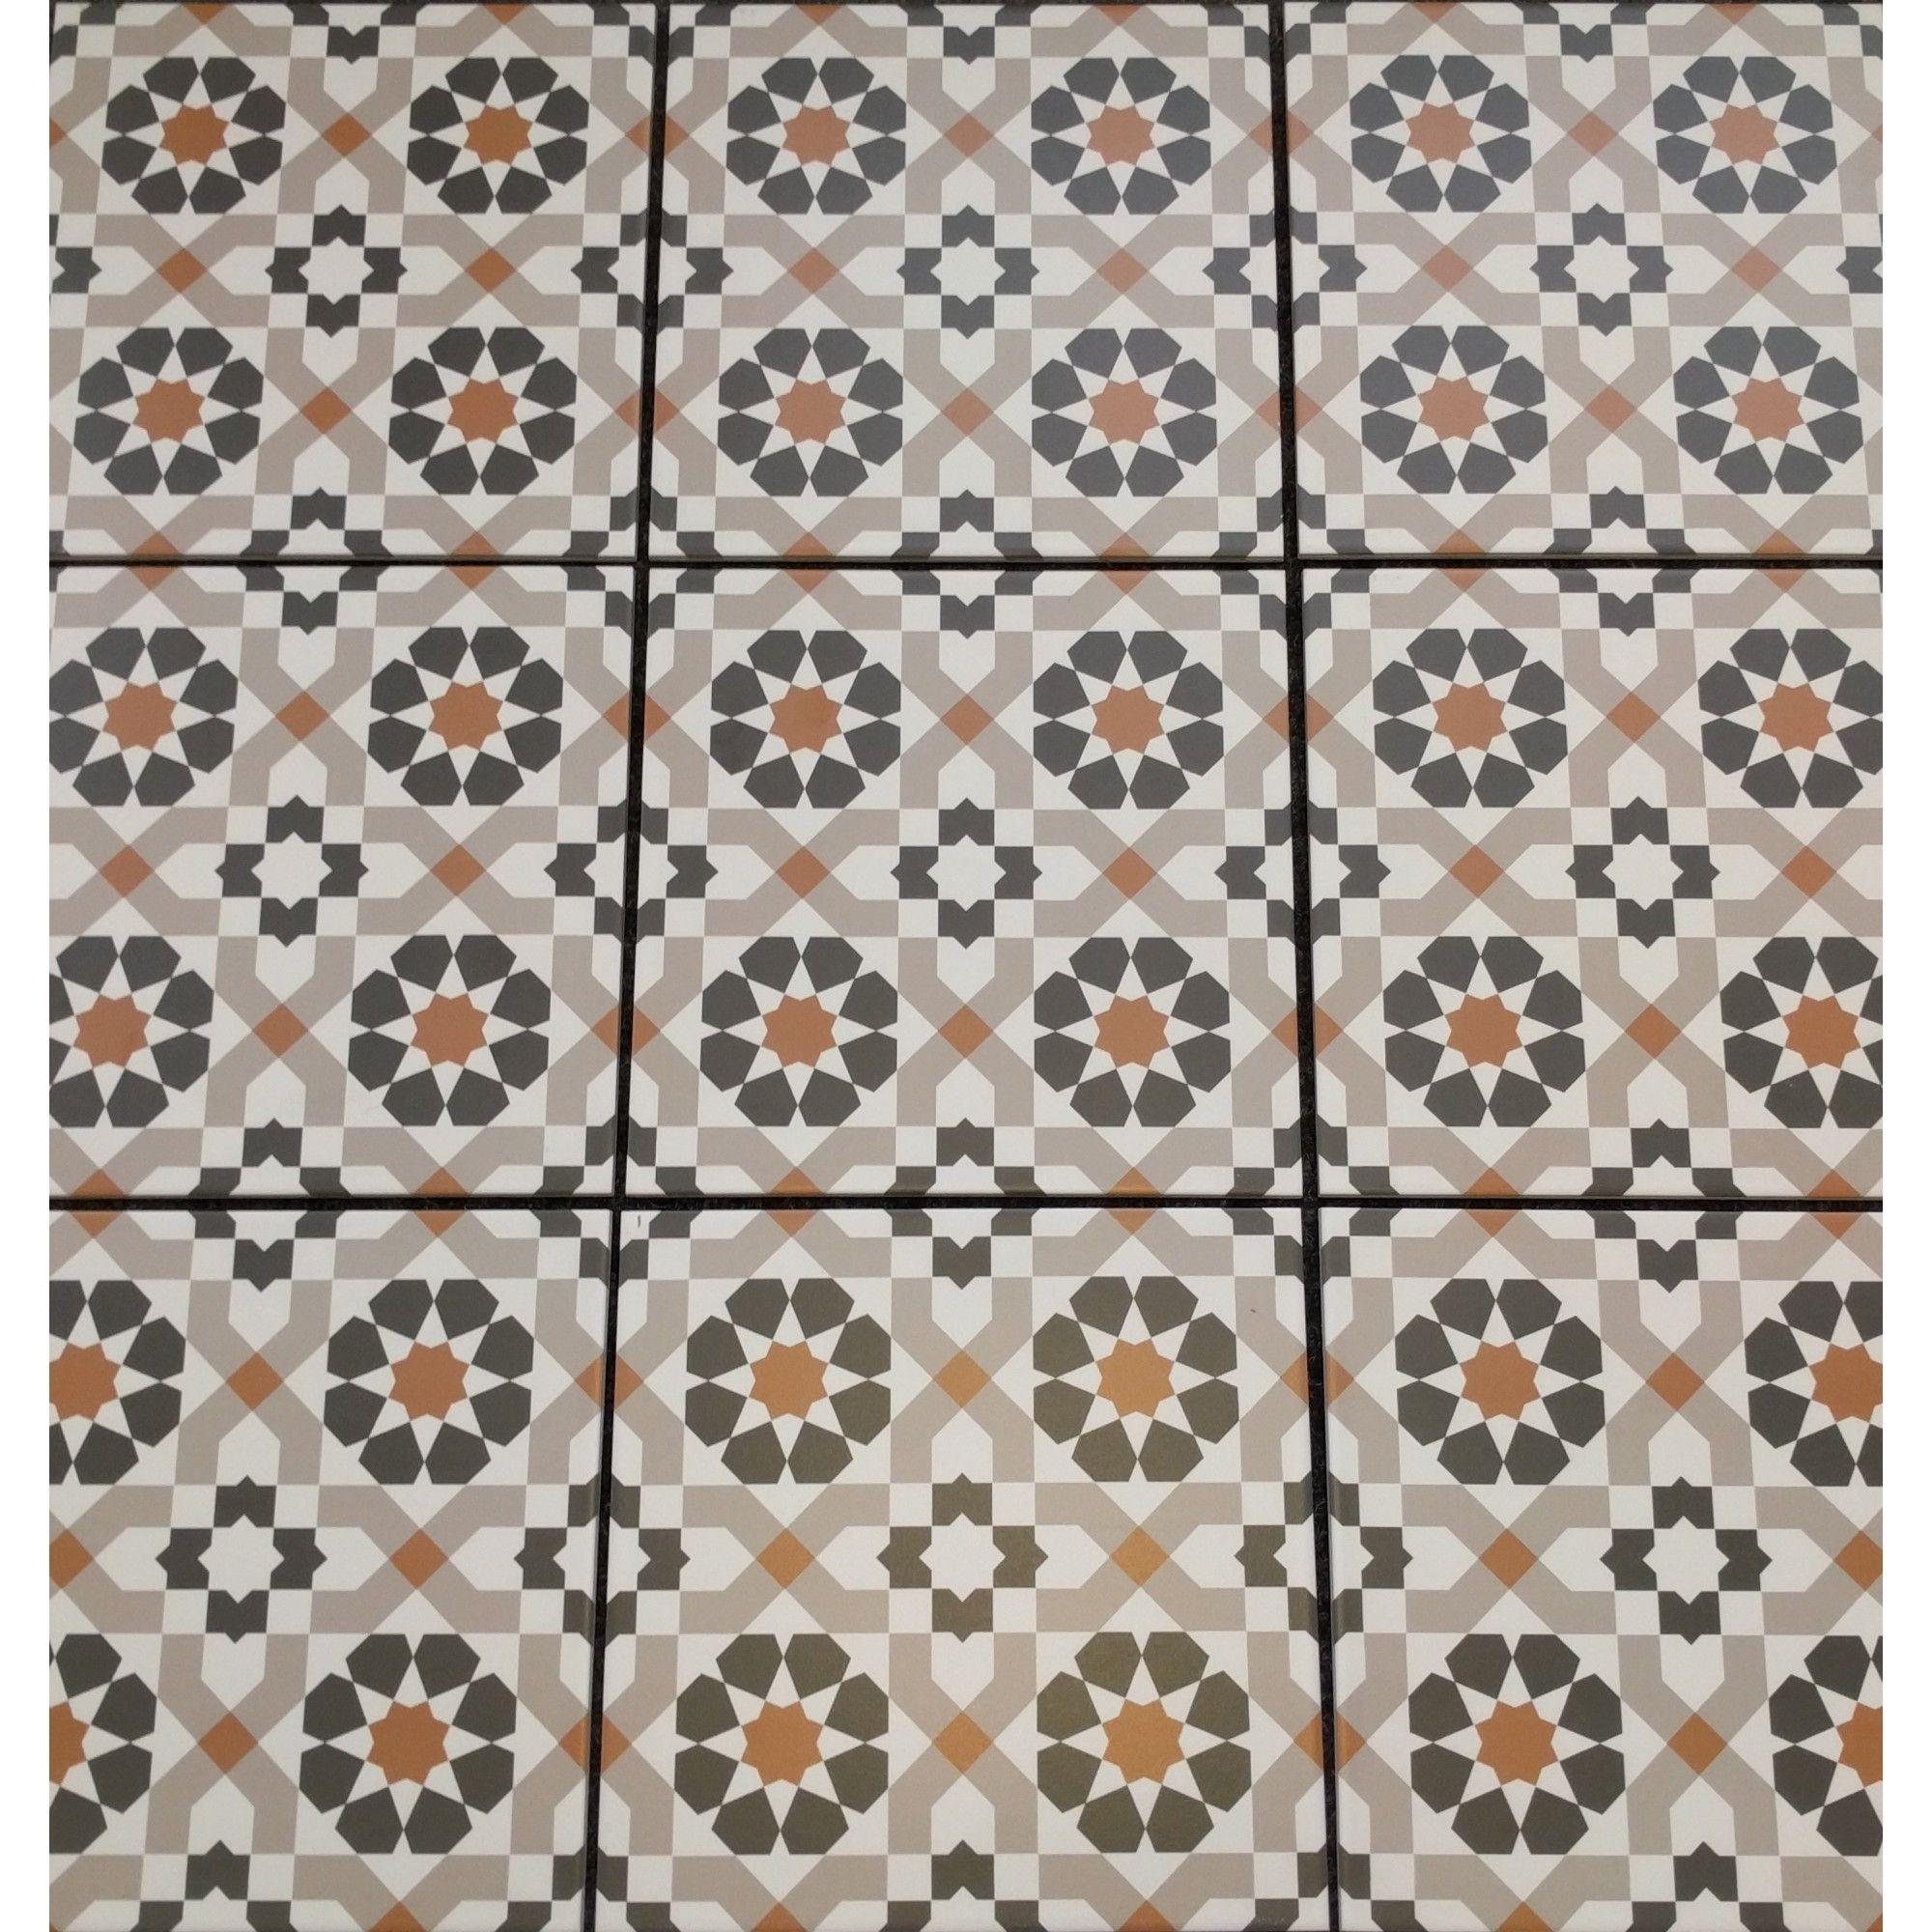 Marrakech Catarina Copper 16 Pattern Floor Tile Patterned Floor Tiles Floor Patterns Geometric Tiles